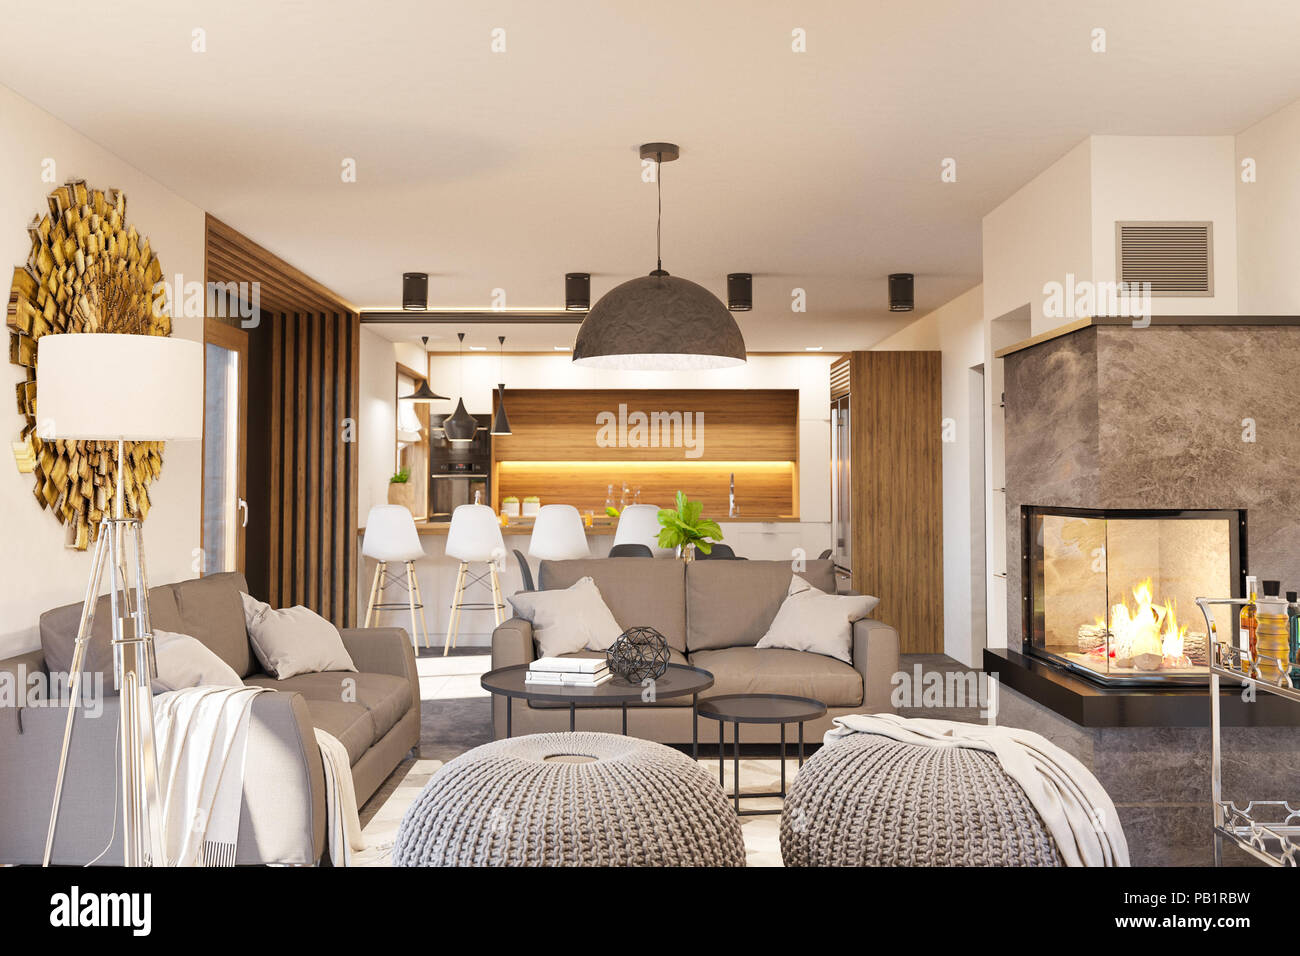 Soggiorno e cucina arredamento con camino casa moderna in - Stile casa moderna ...